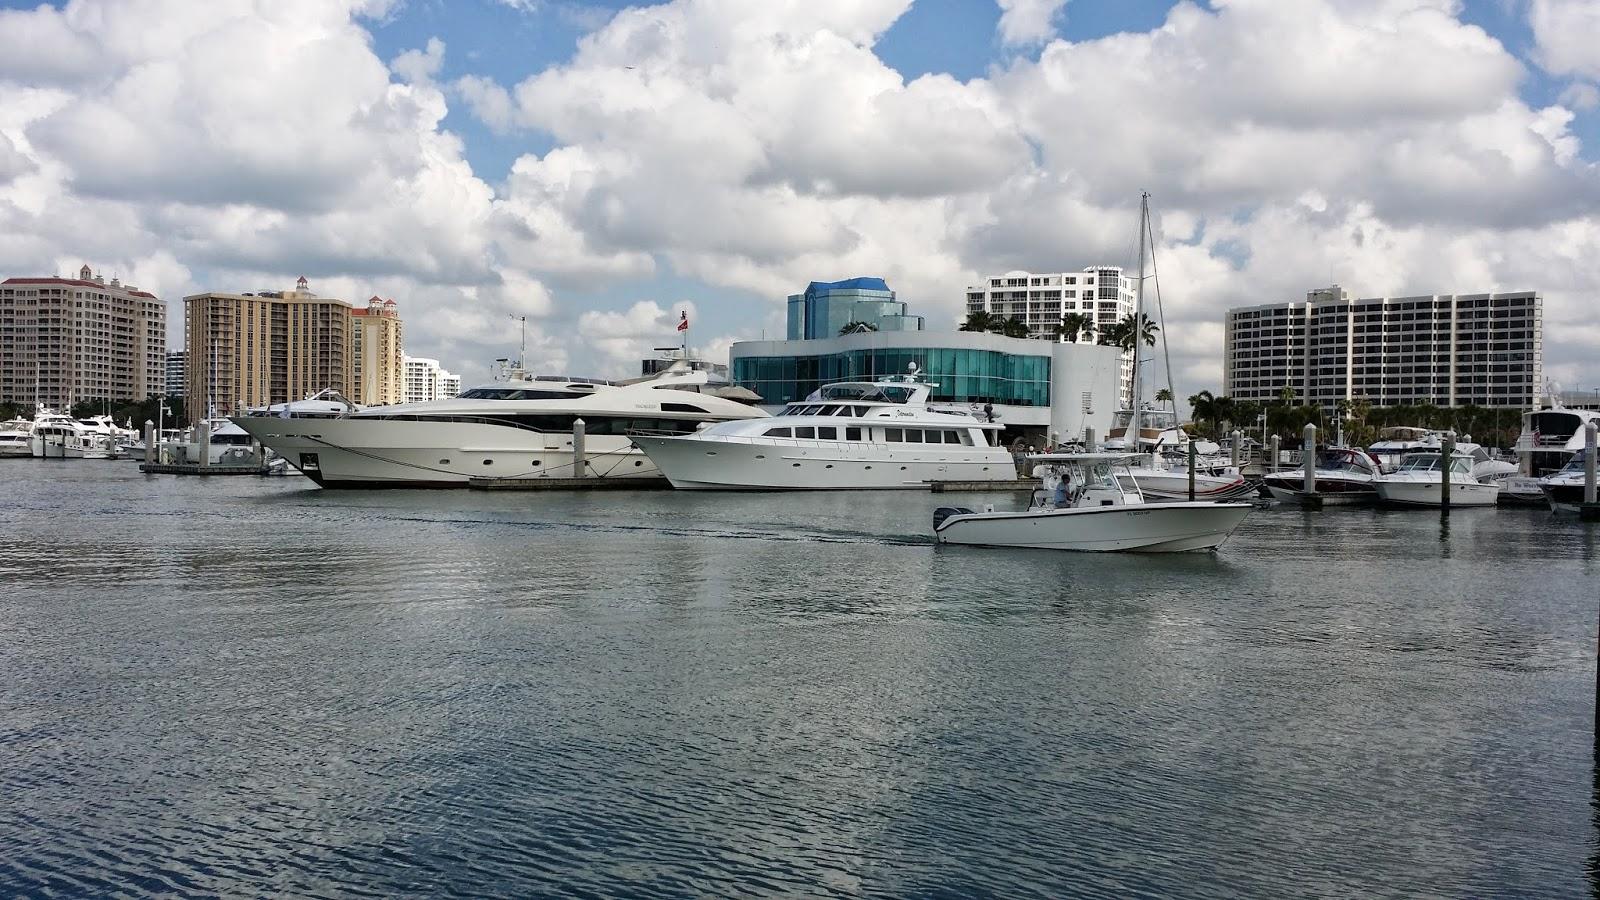 Sarasota - A Pit Stop for Yachtsmen